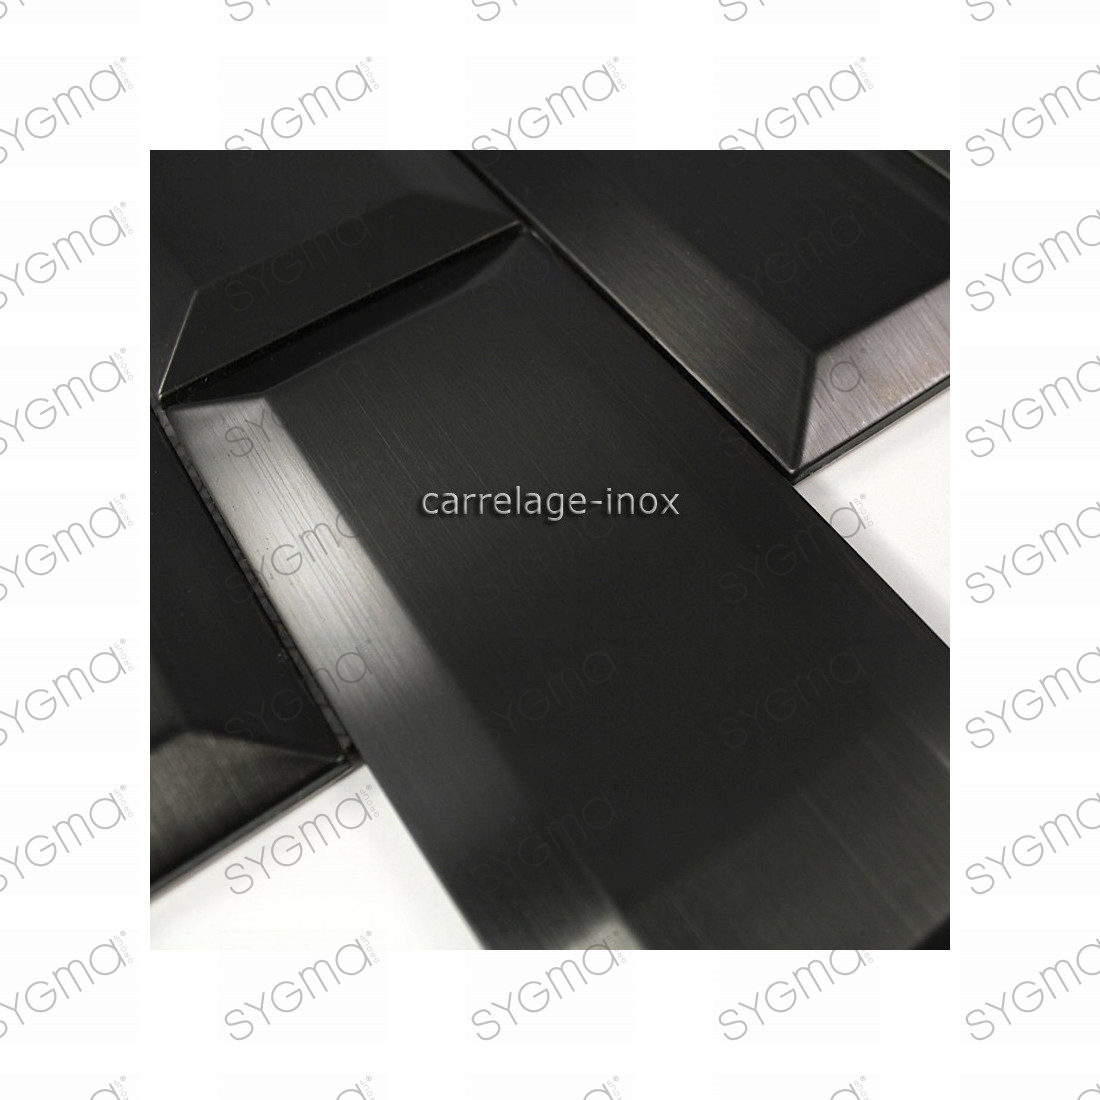 carrelage inox mosaique cuisine metro noir carrelage. Black Bedroom Furniture Sets. Home Design Ideas